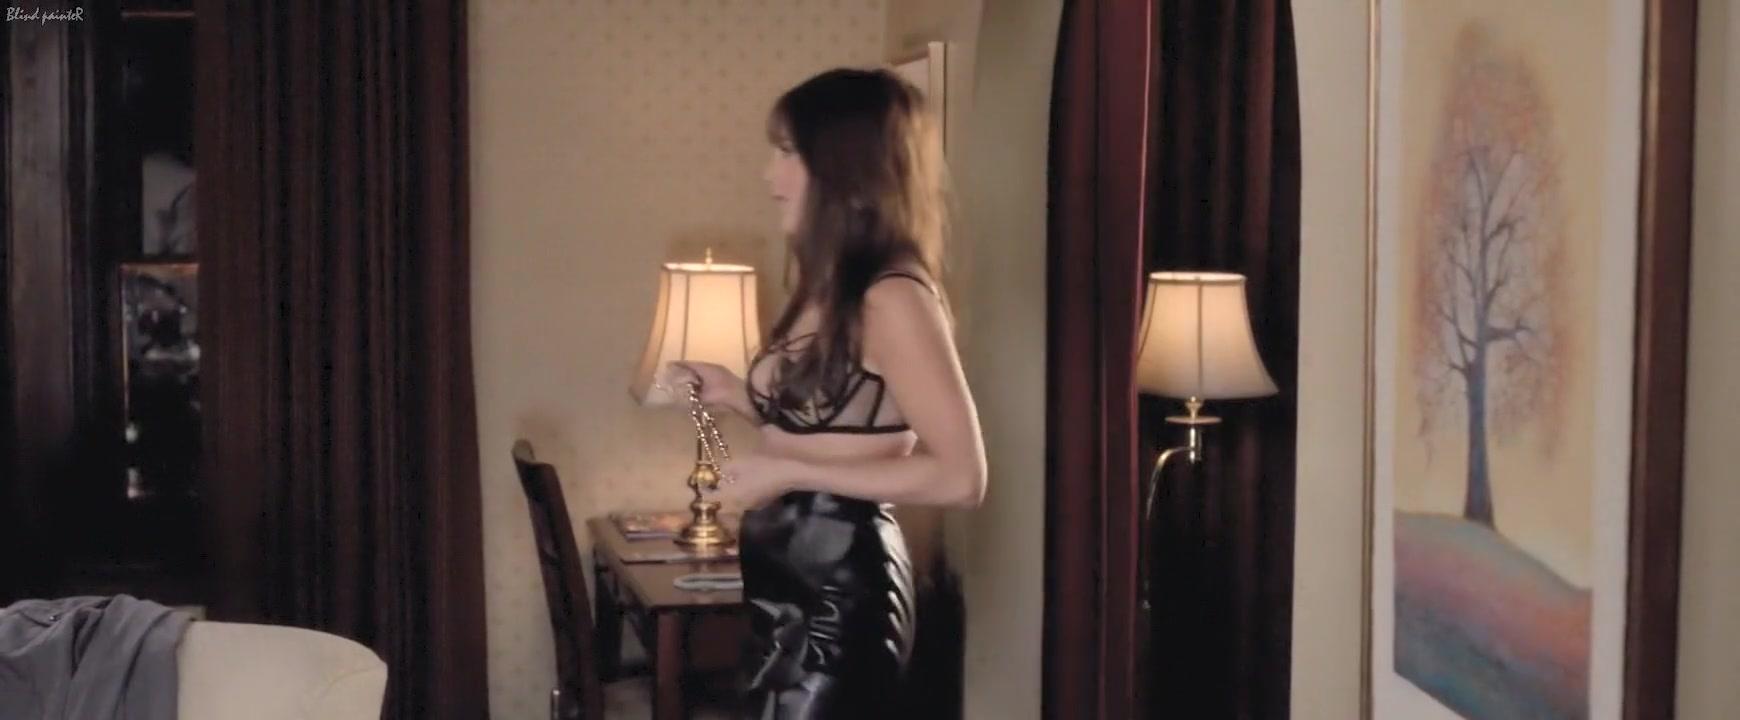 Porn Pics & Movies Free girls dating sim